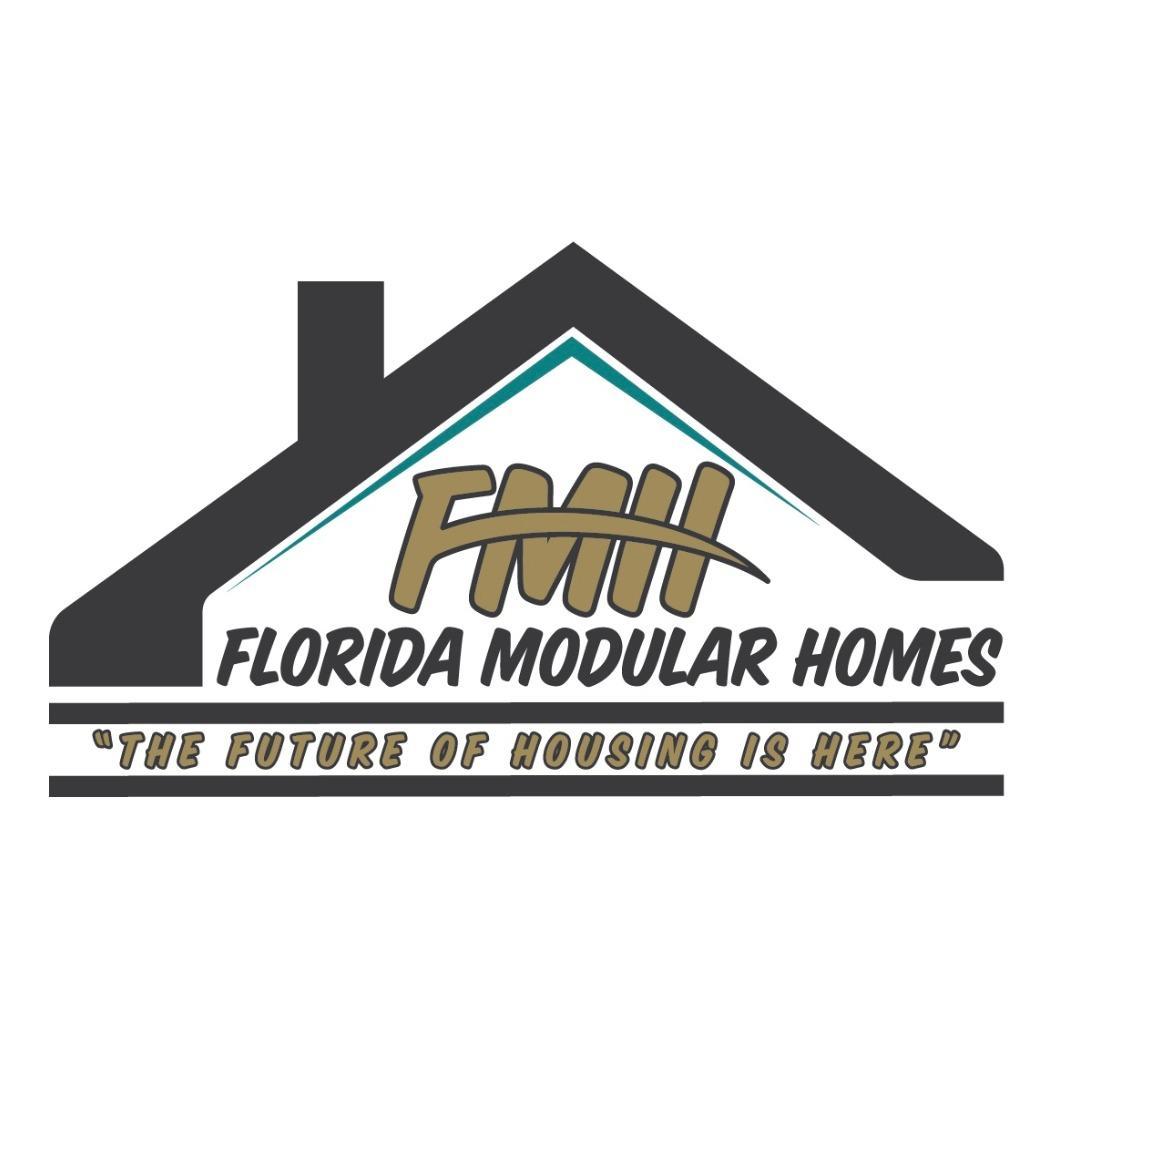 Florida Modular Homes